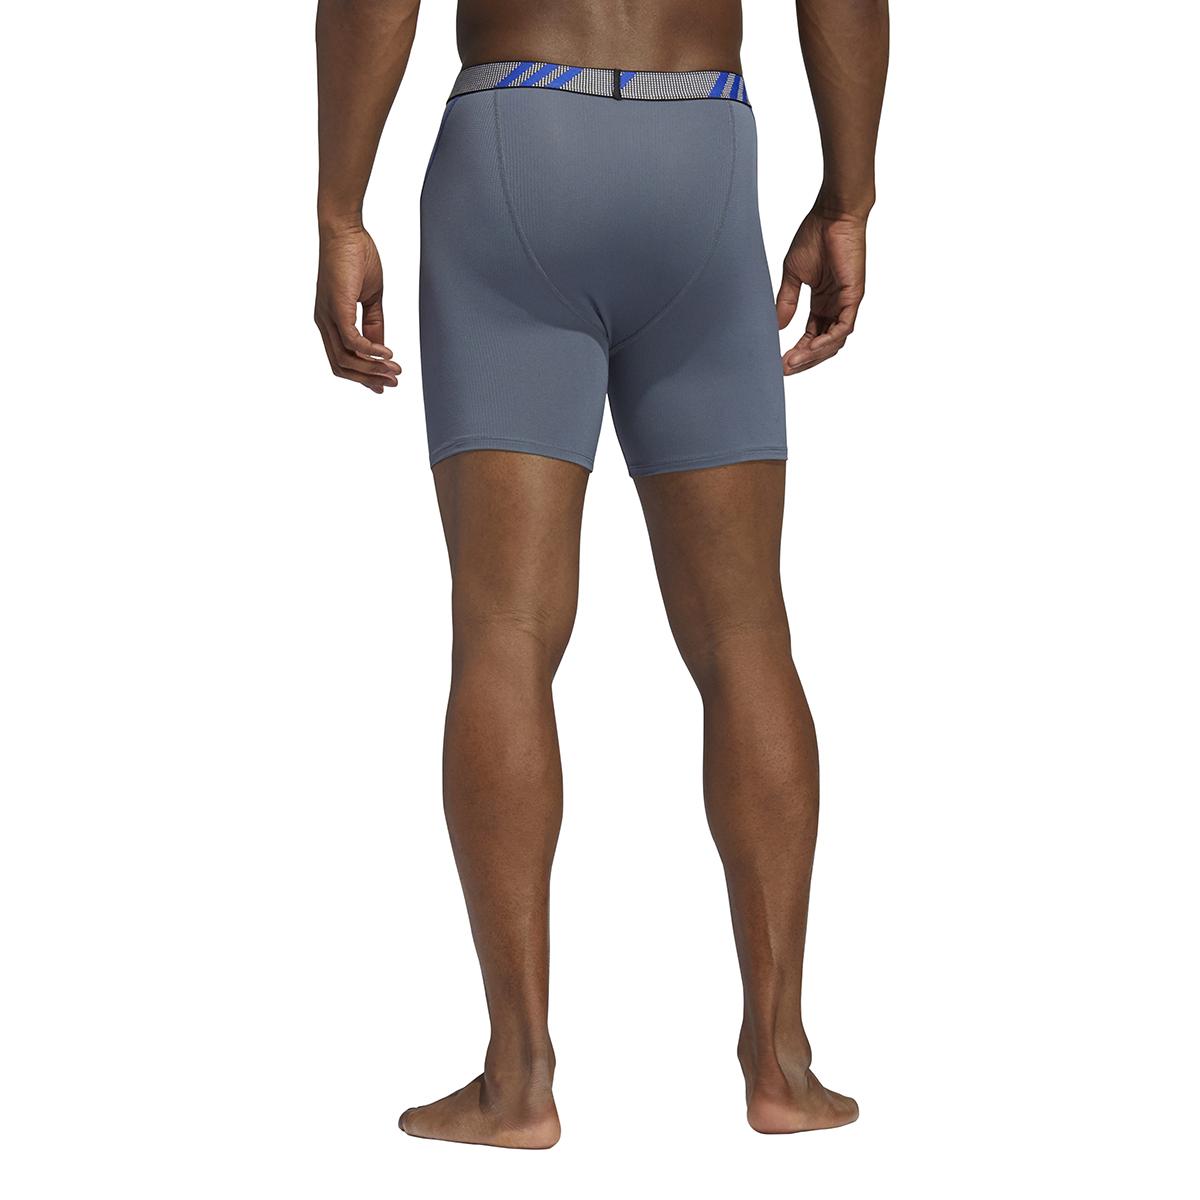 Men's Adidas Performance Mesh 3 Pack Boxer Briefs - Color: Onix Grey/Blue - Size: S, Onix Grey/Blue, large, image 5